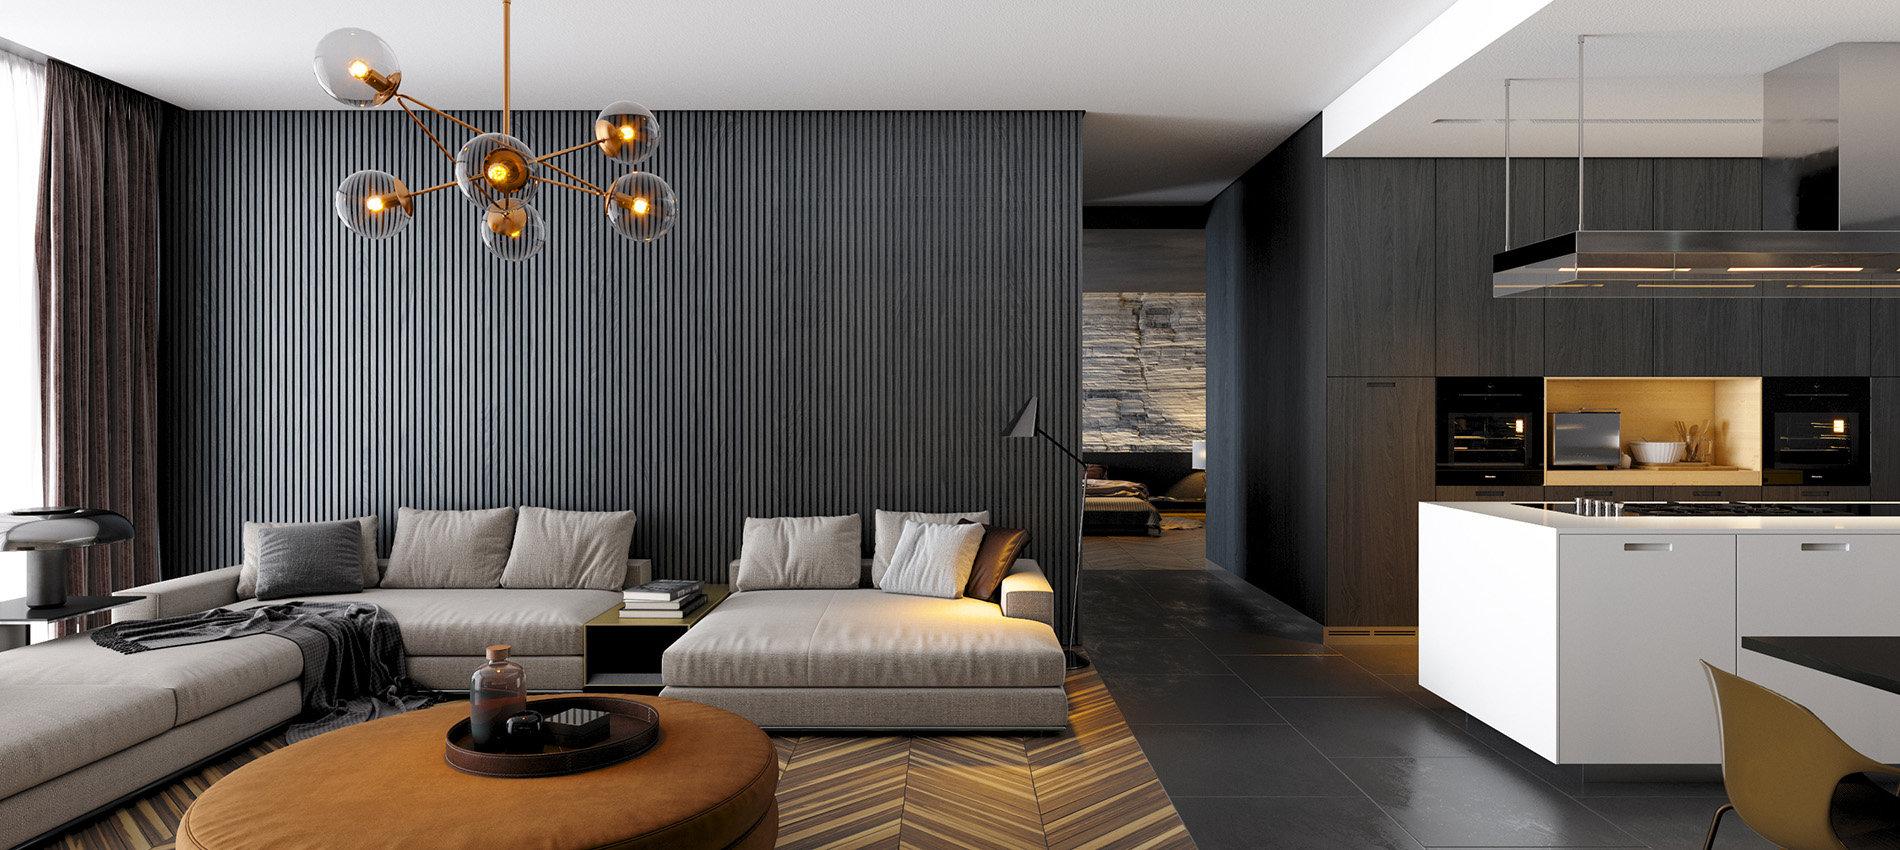 DIAMENT APARTMENT - Living room visualization